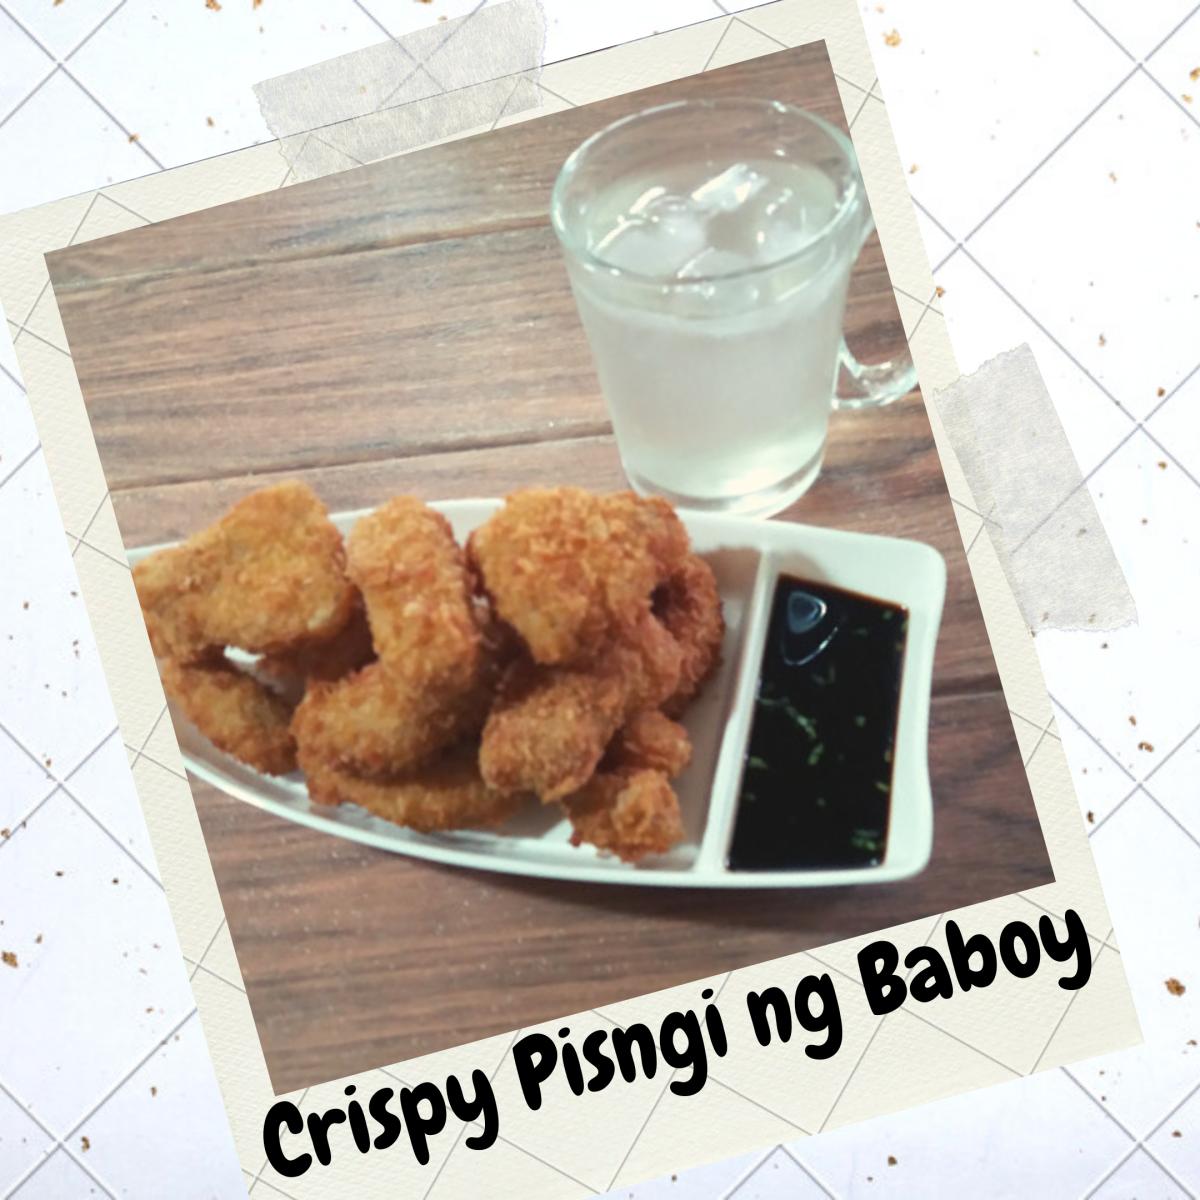 Learn how to make crispy pisngi ng baboy